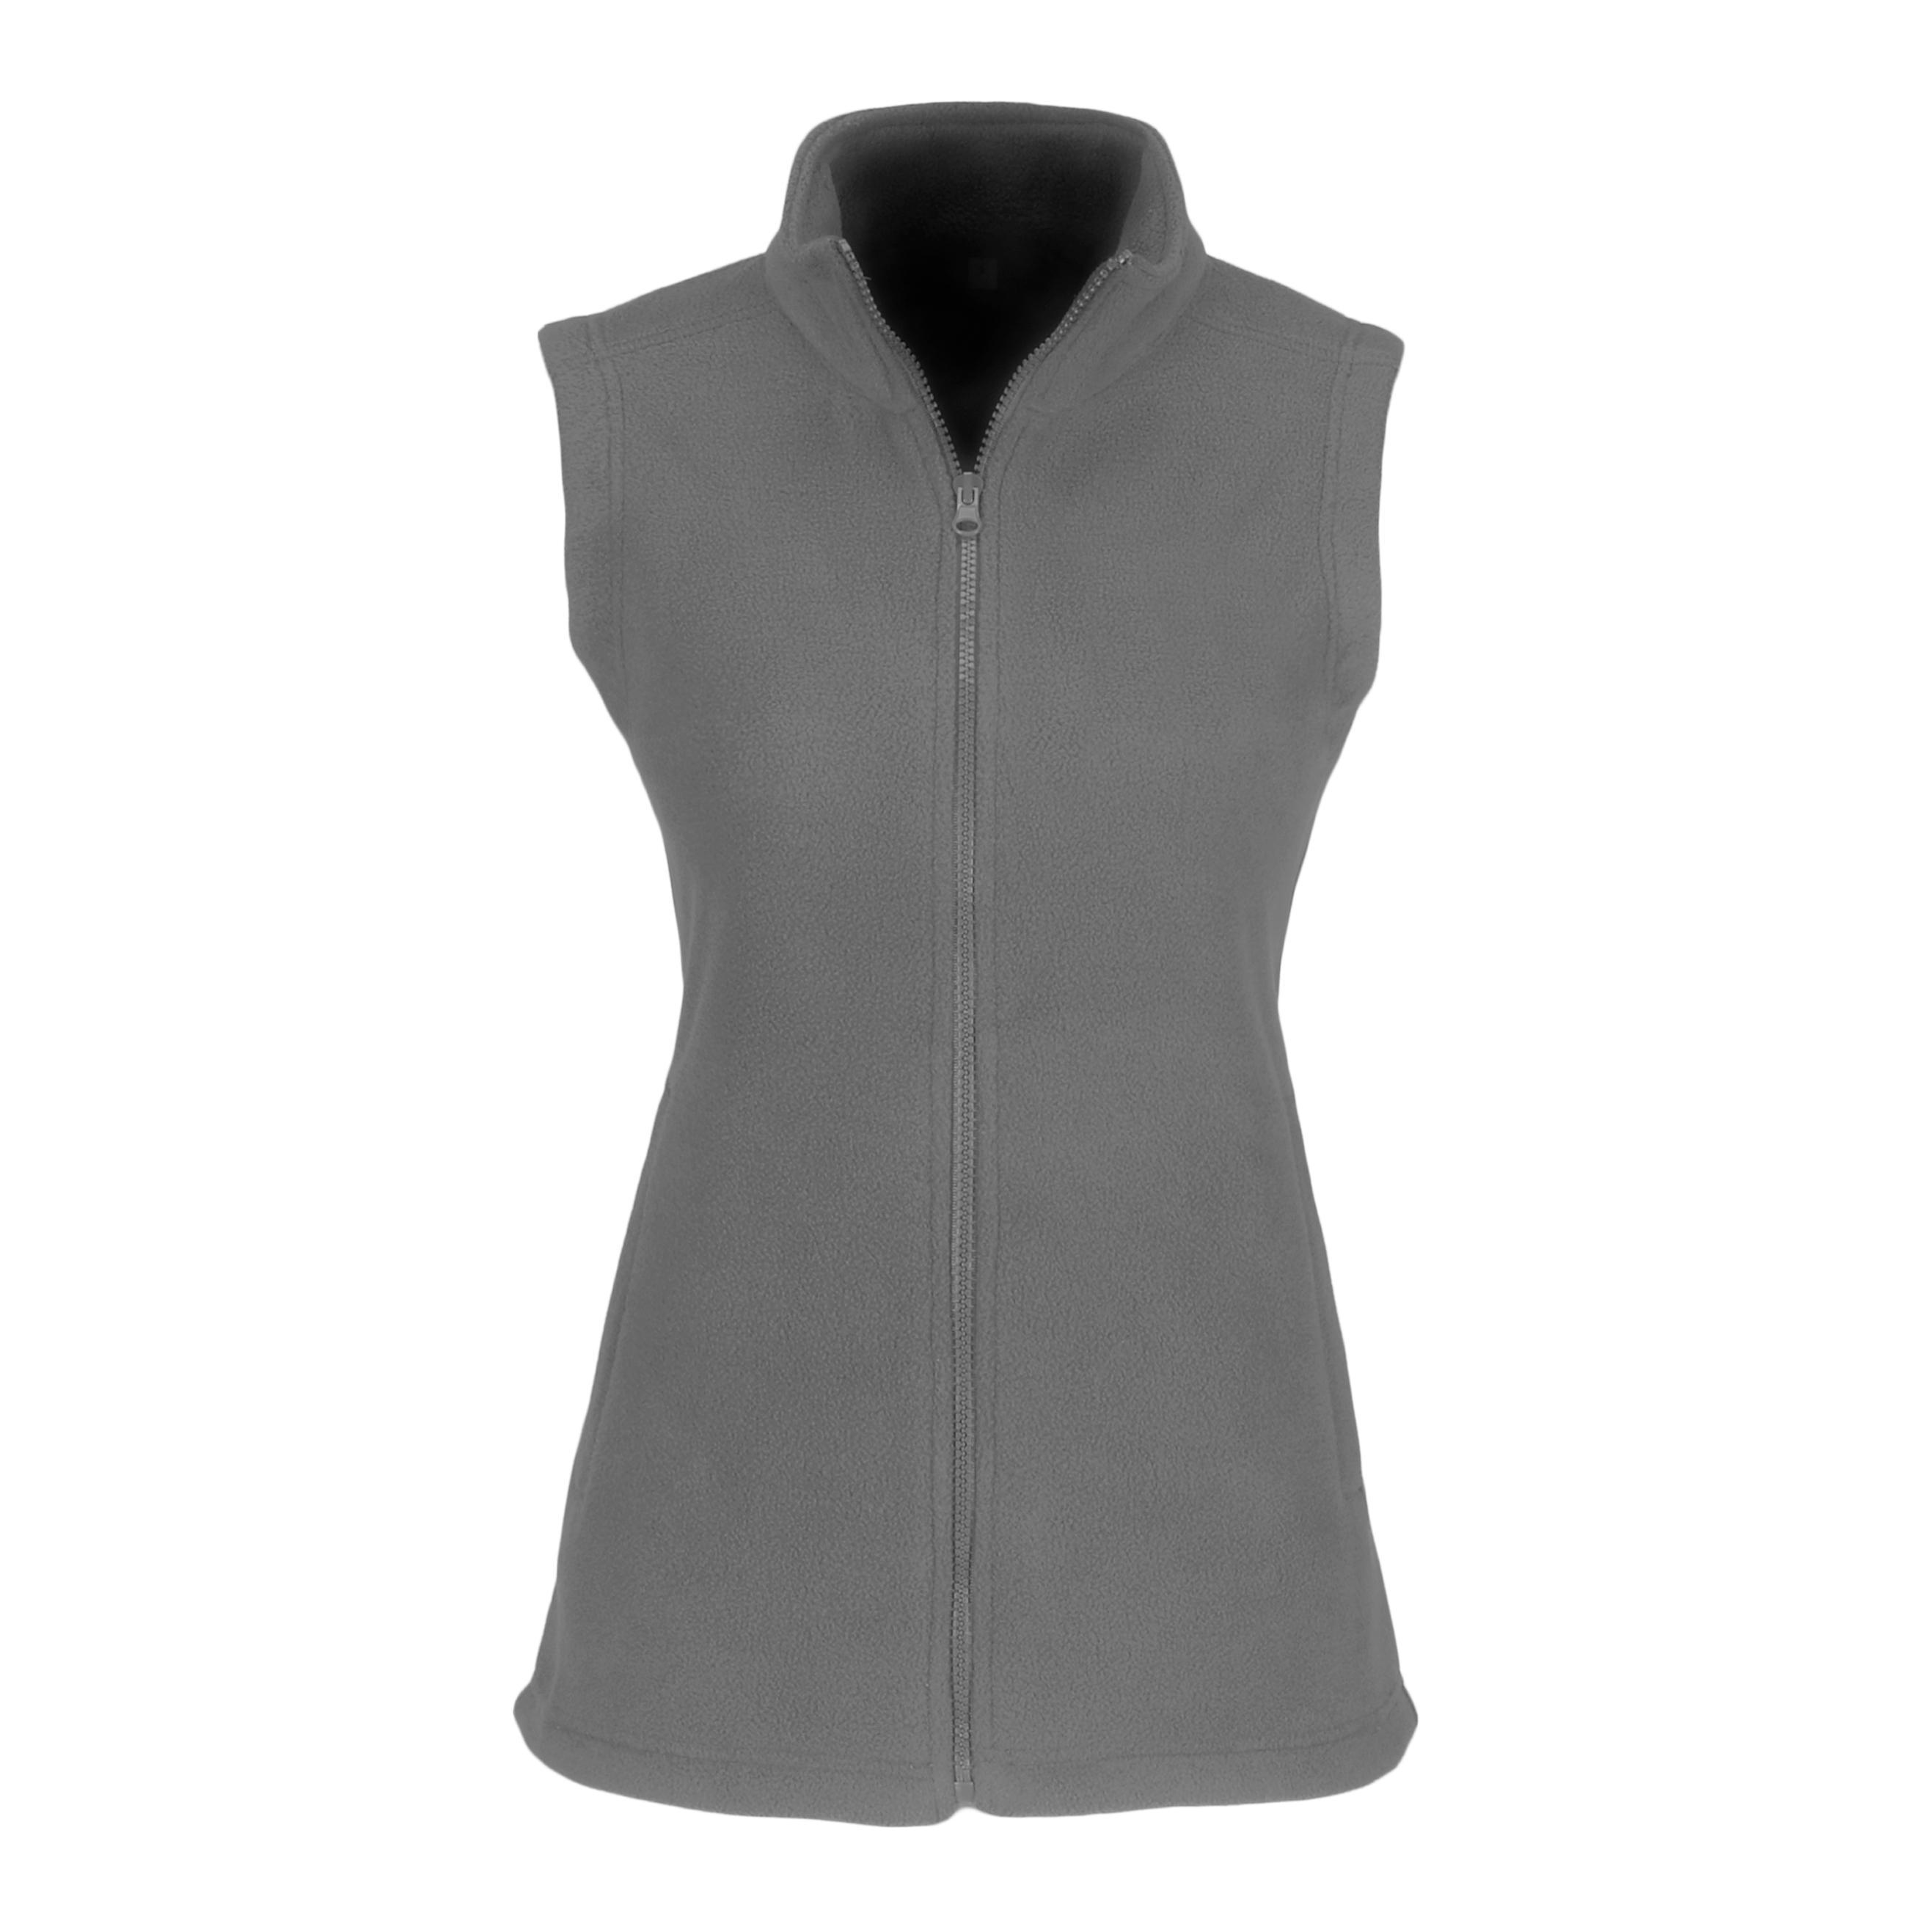 Ladies Yukon Micro Fleece Bodywarmer - Grey Only